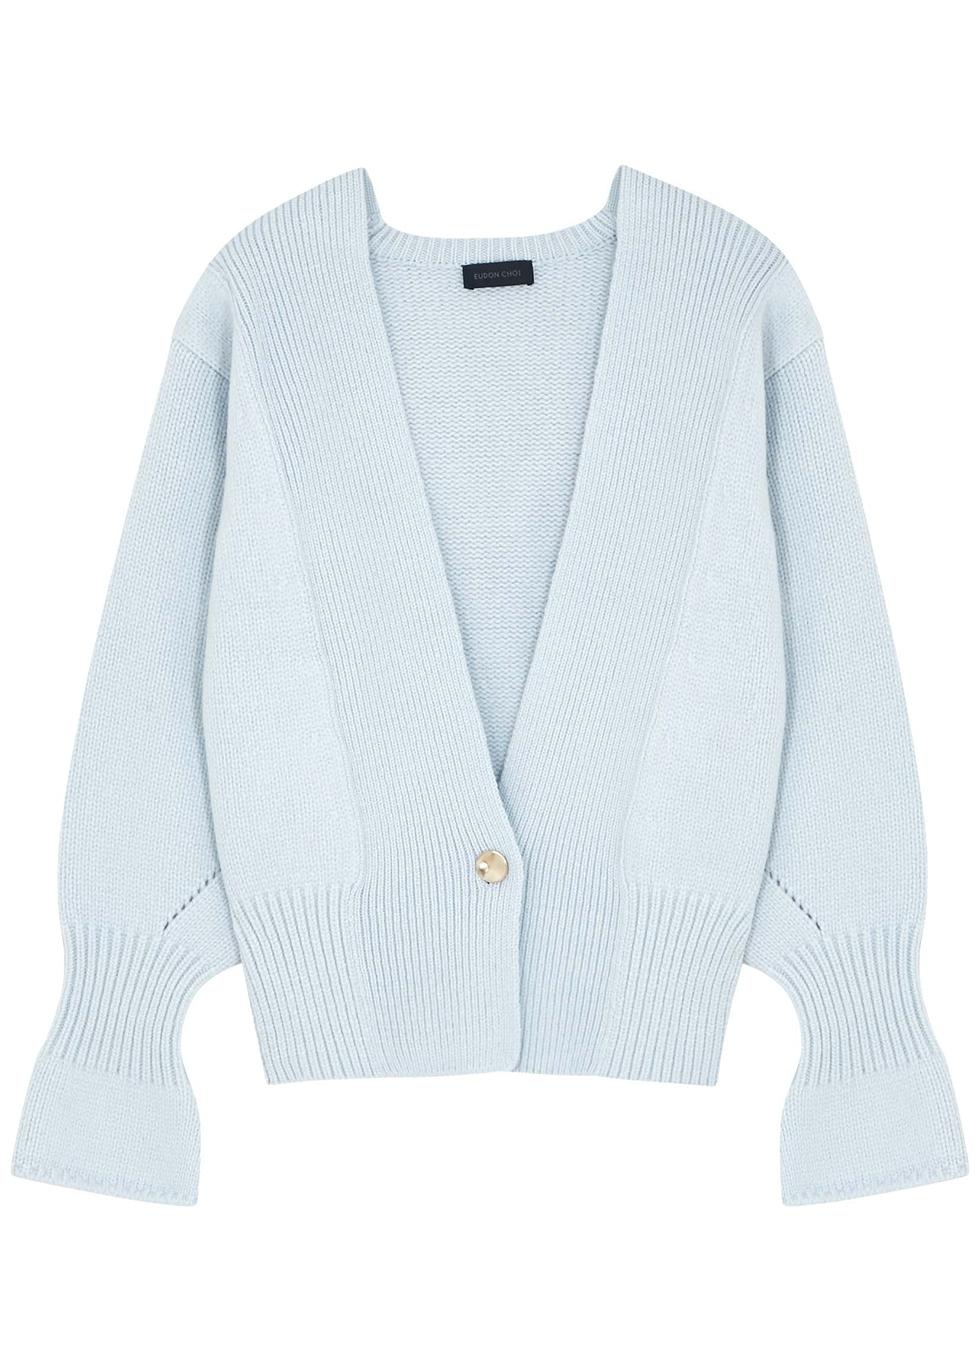 Bella light blue wool-blend cardigan